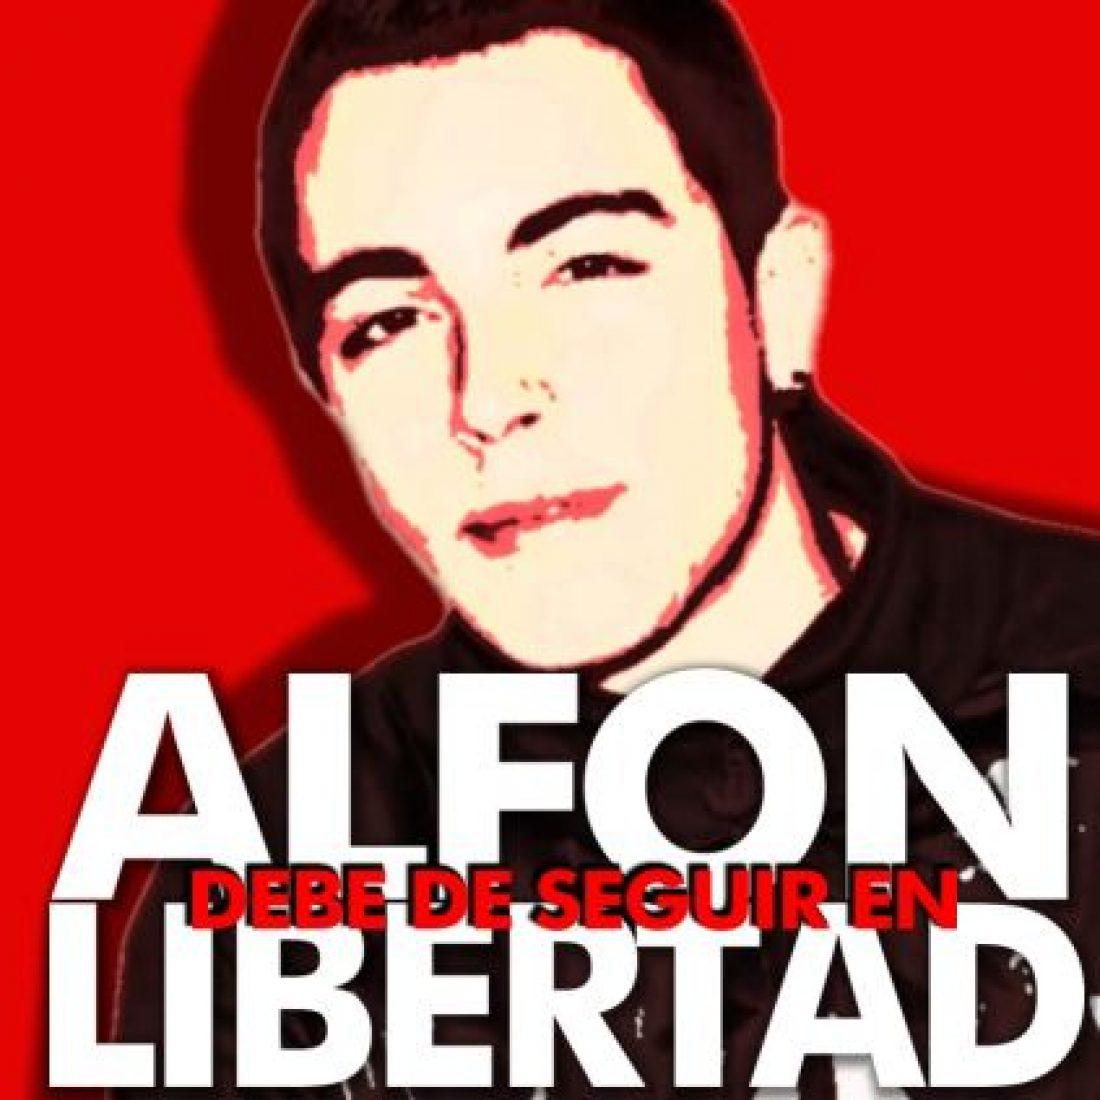 16-S: Jornada de Solidaridad Internacional por la libertad de Alfon. Convocatorias